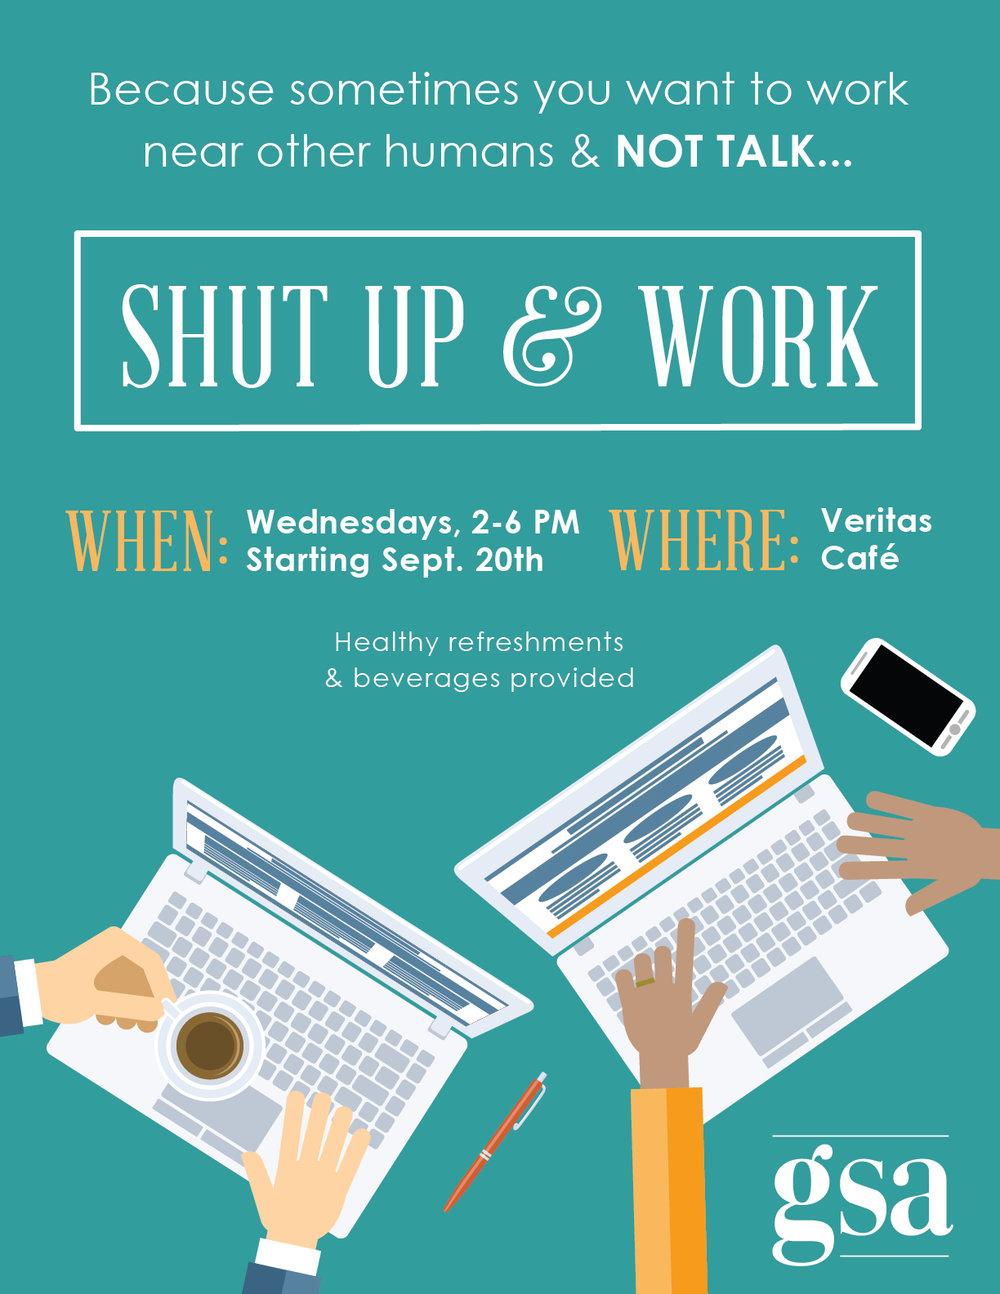 shutup-work-poster-01.jpg